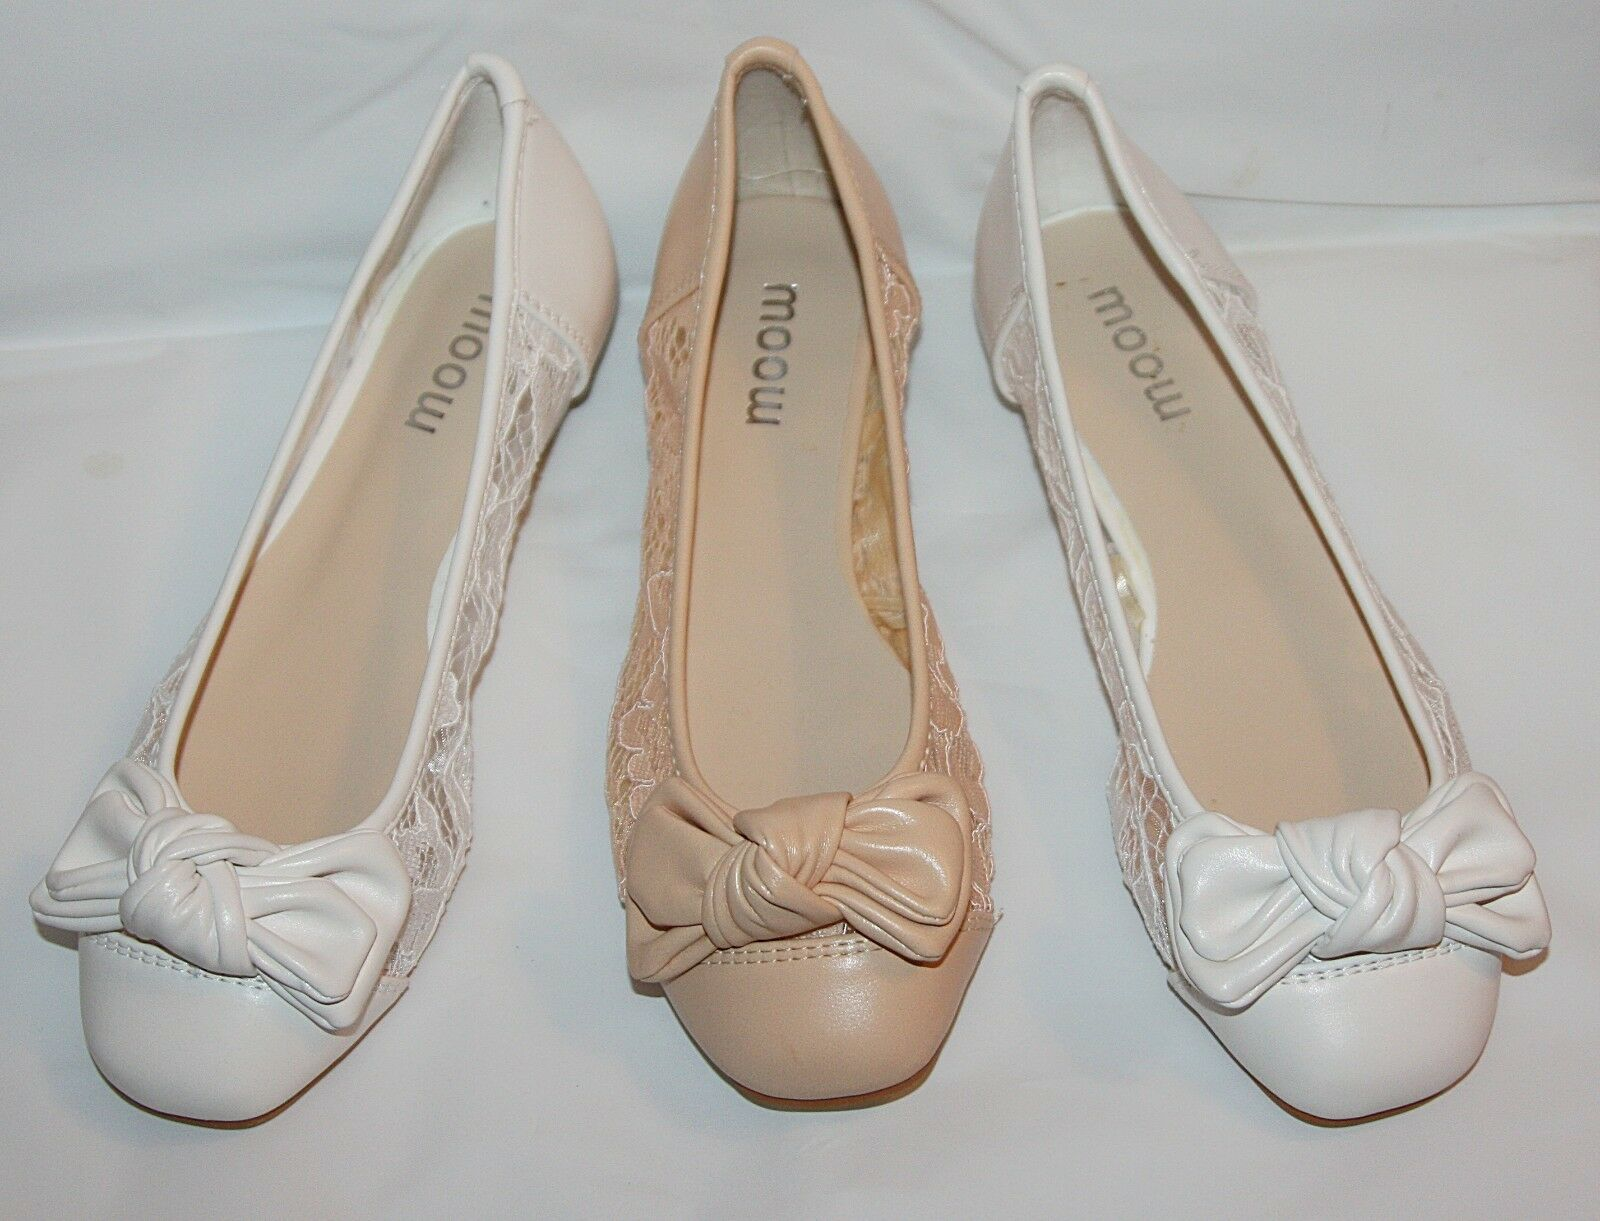 BALLERINA SPITZE BRAUT Zapatos  IN WEISS AUS SPITZE BALLERINA MIT SCHLEIFE LEDER OPTIK BP5191-BA dc0aa5